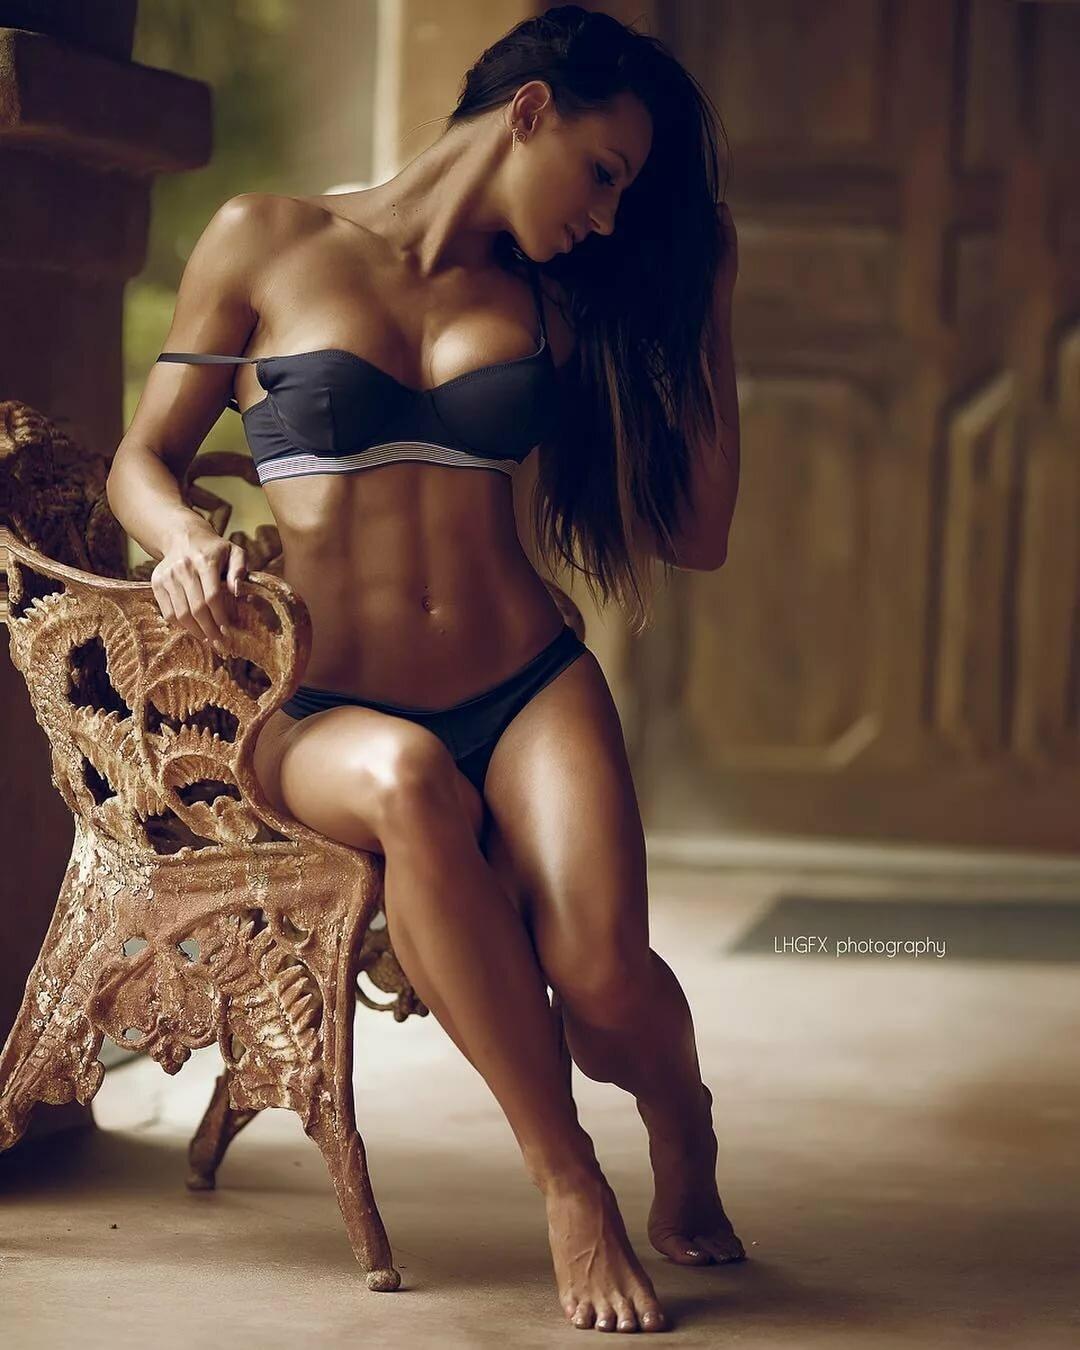 Xxx sexiest fit women